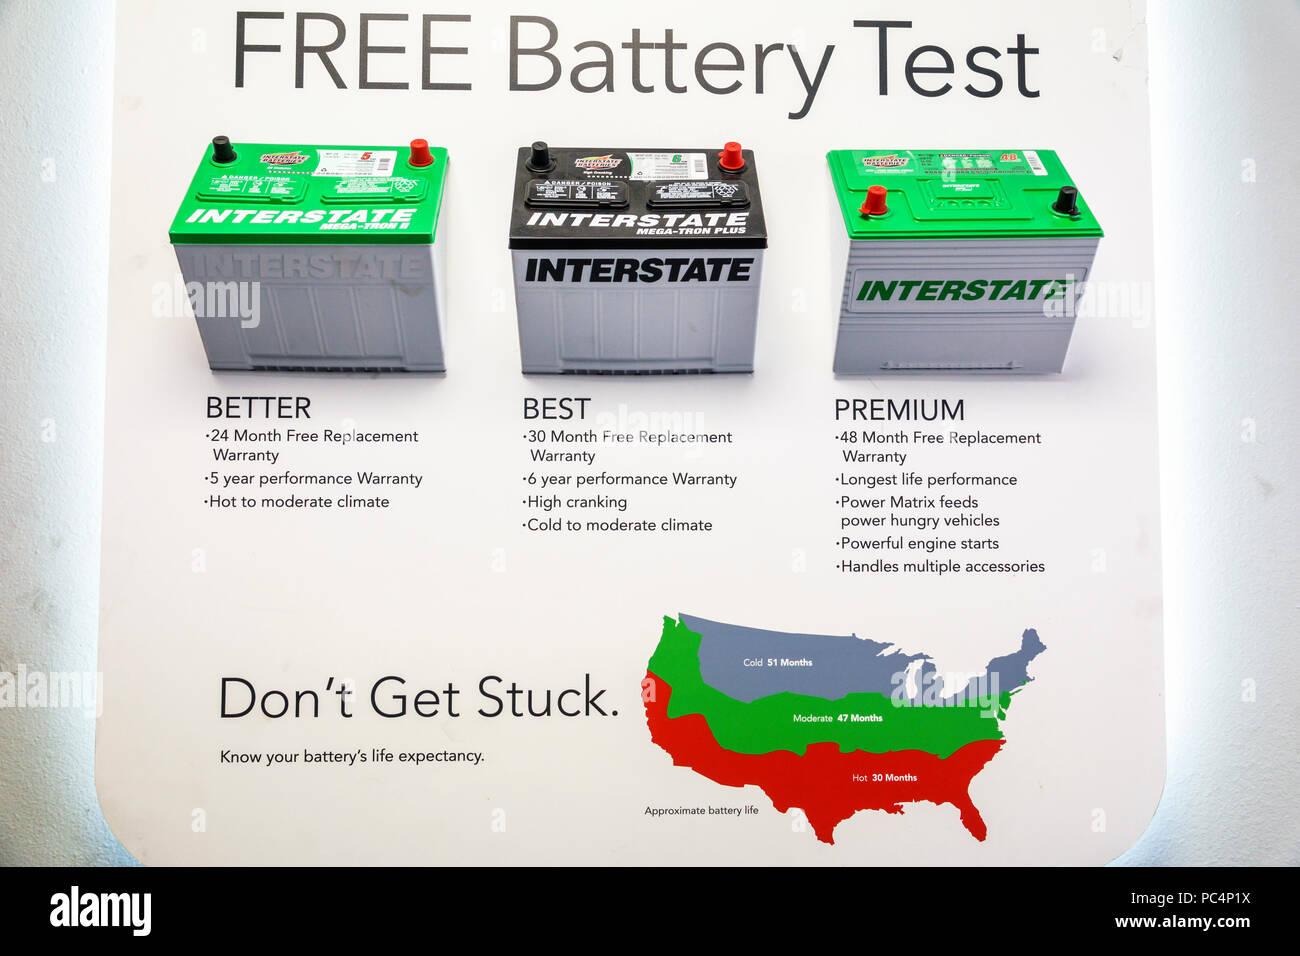 St. Saint Petersburg Florida Tire Kingdom free car battery test poster Interstate brand product comparison - Stock Image